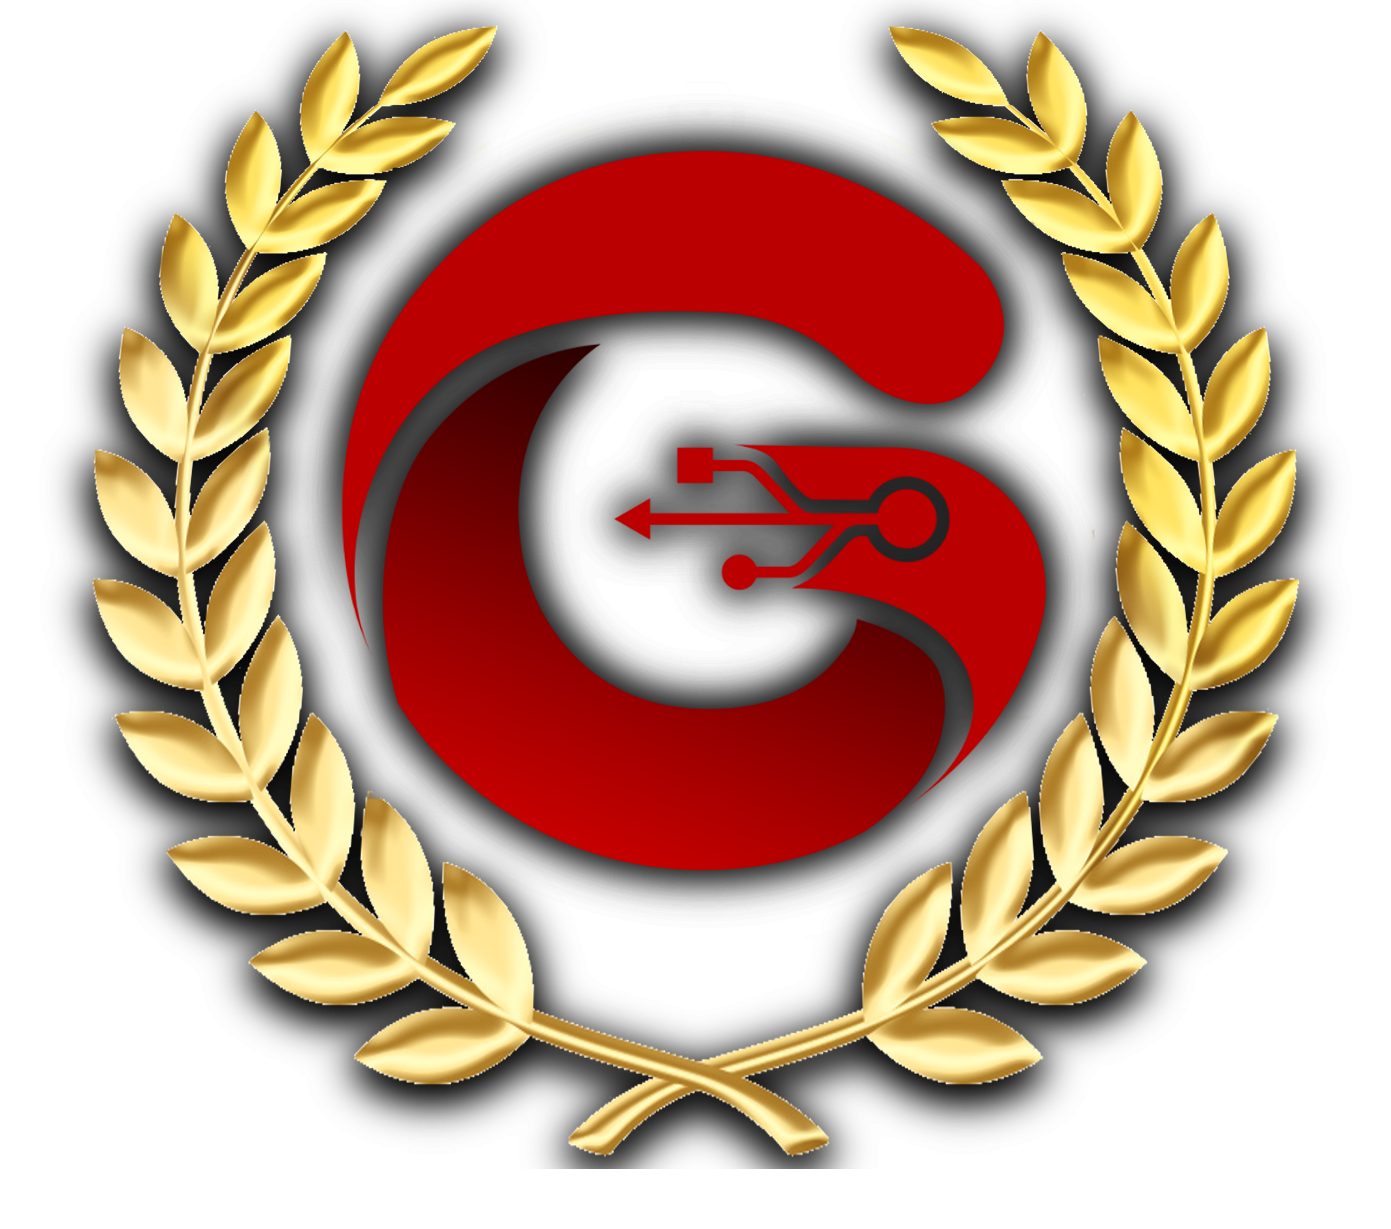 Gizlogic Awards GOLD